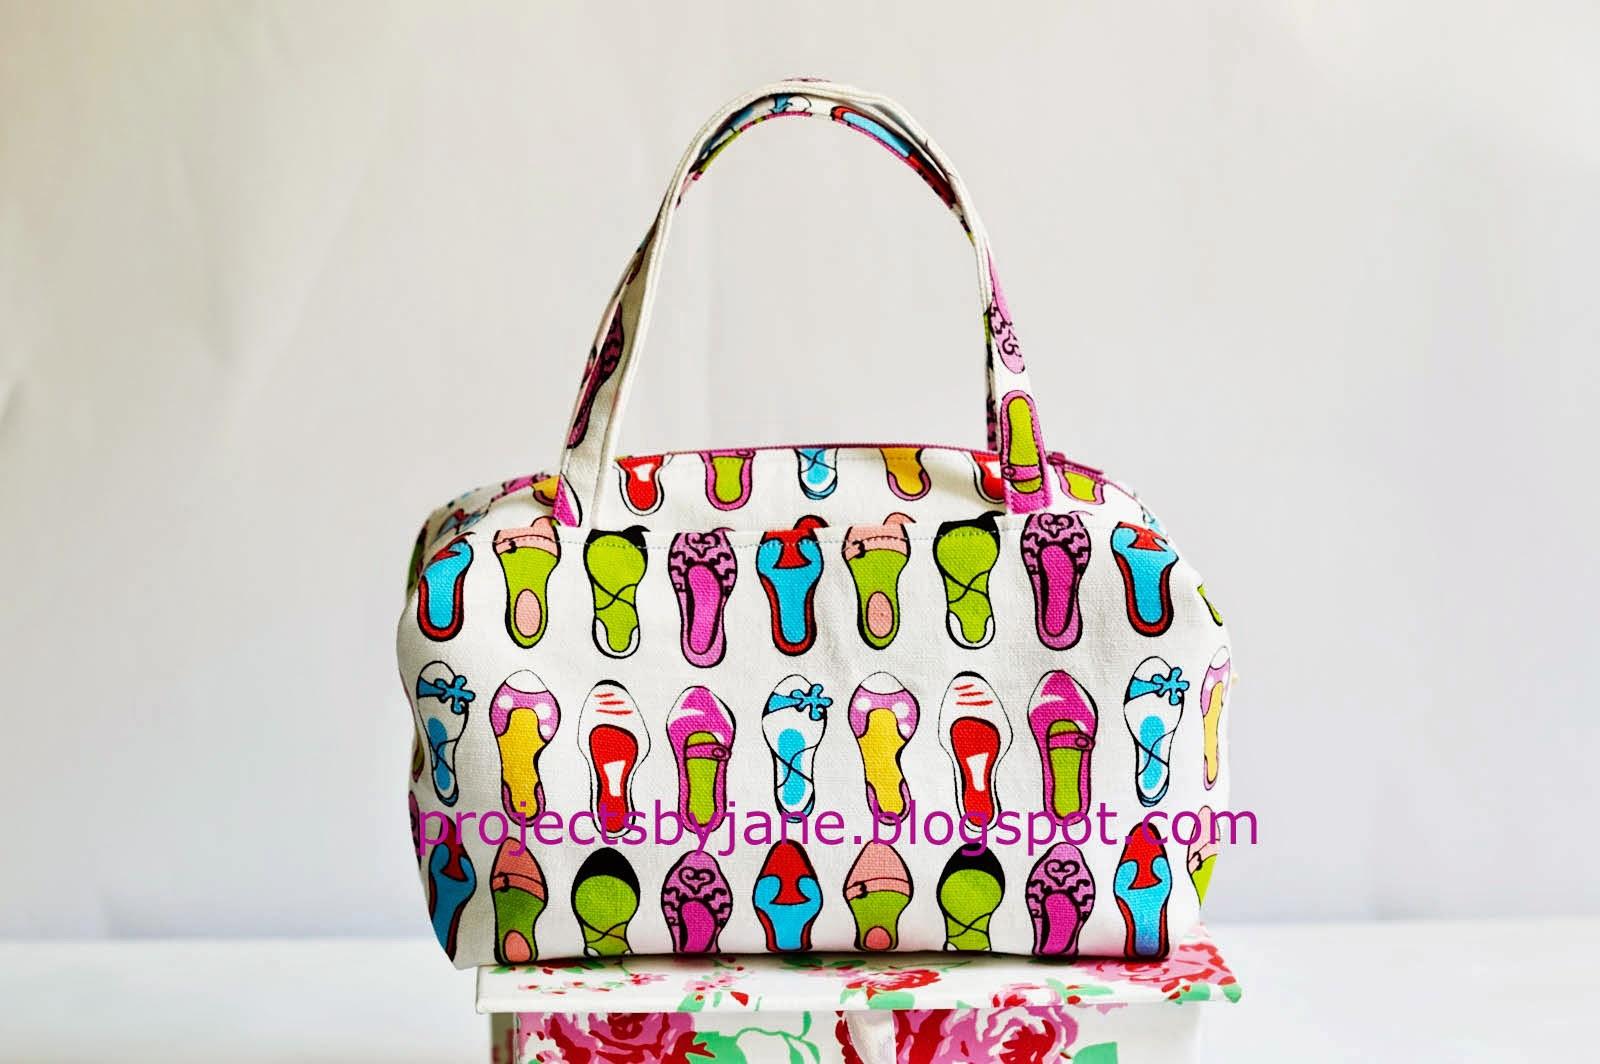 https://www.etsy.com/listing/204278646/janes-little-boxy-bag-pdf-pattern?ref=shop_home_active_5